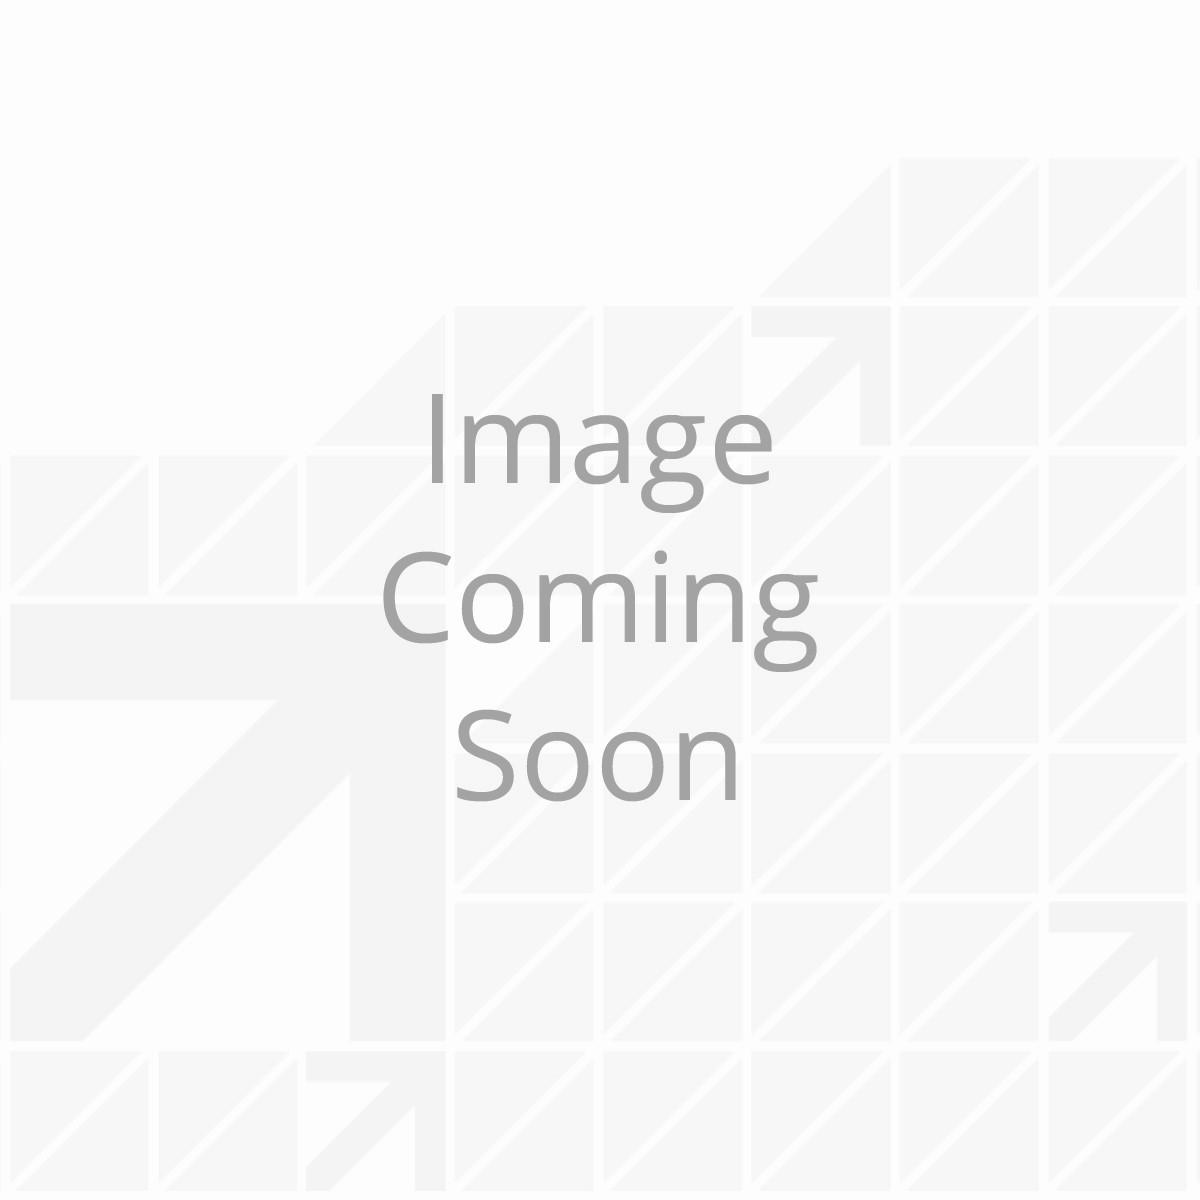 Axle Hanger - Various Sizes